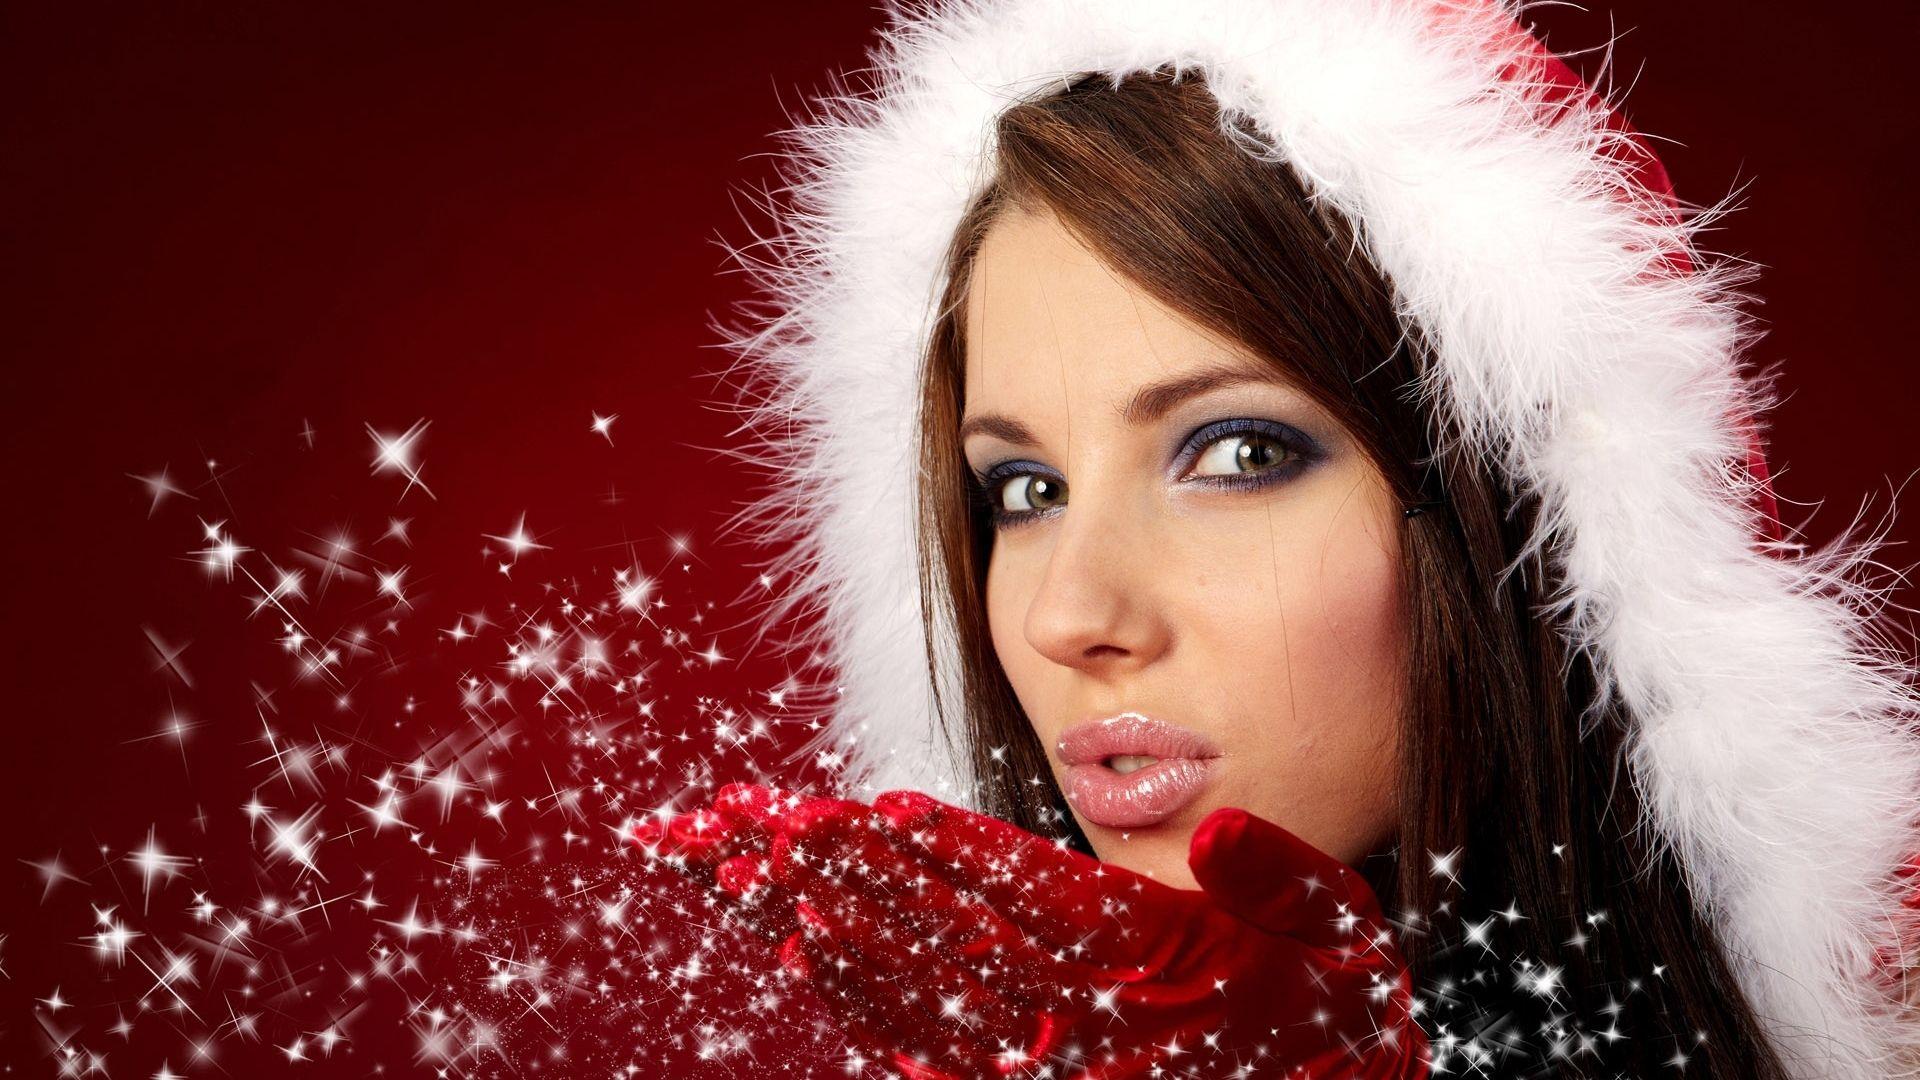 Hd Wallpapers Widescreen 1080P 3D - Cute Christmas Girl Hd